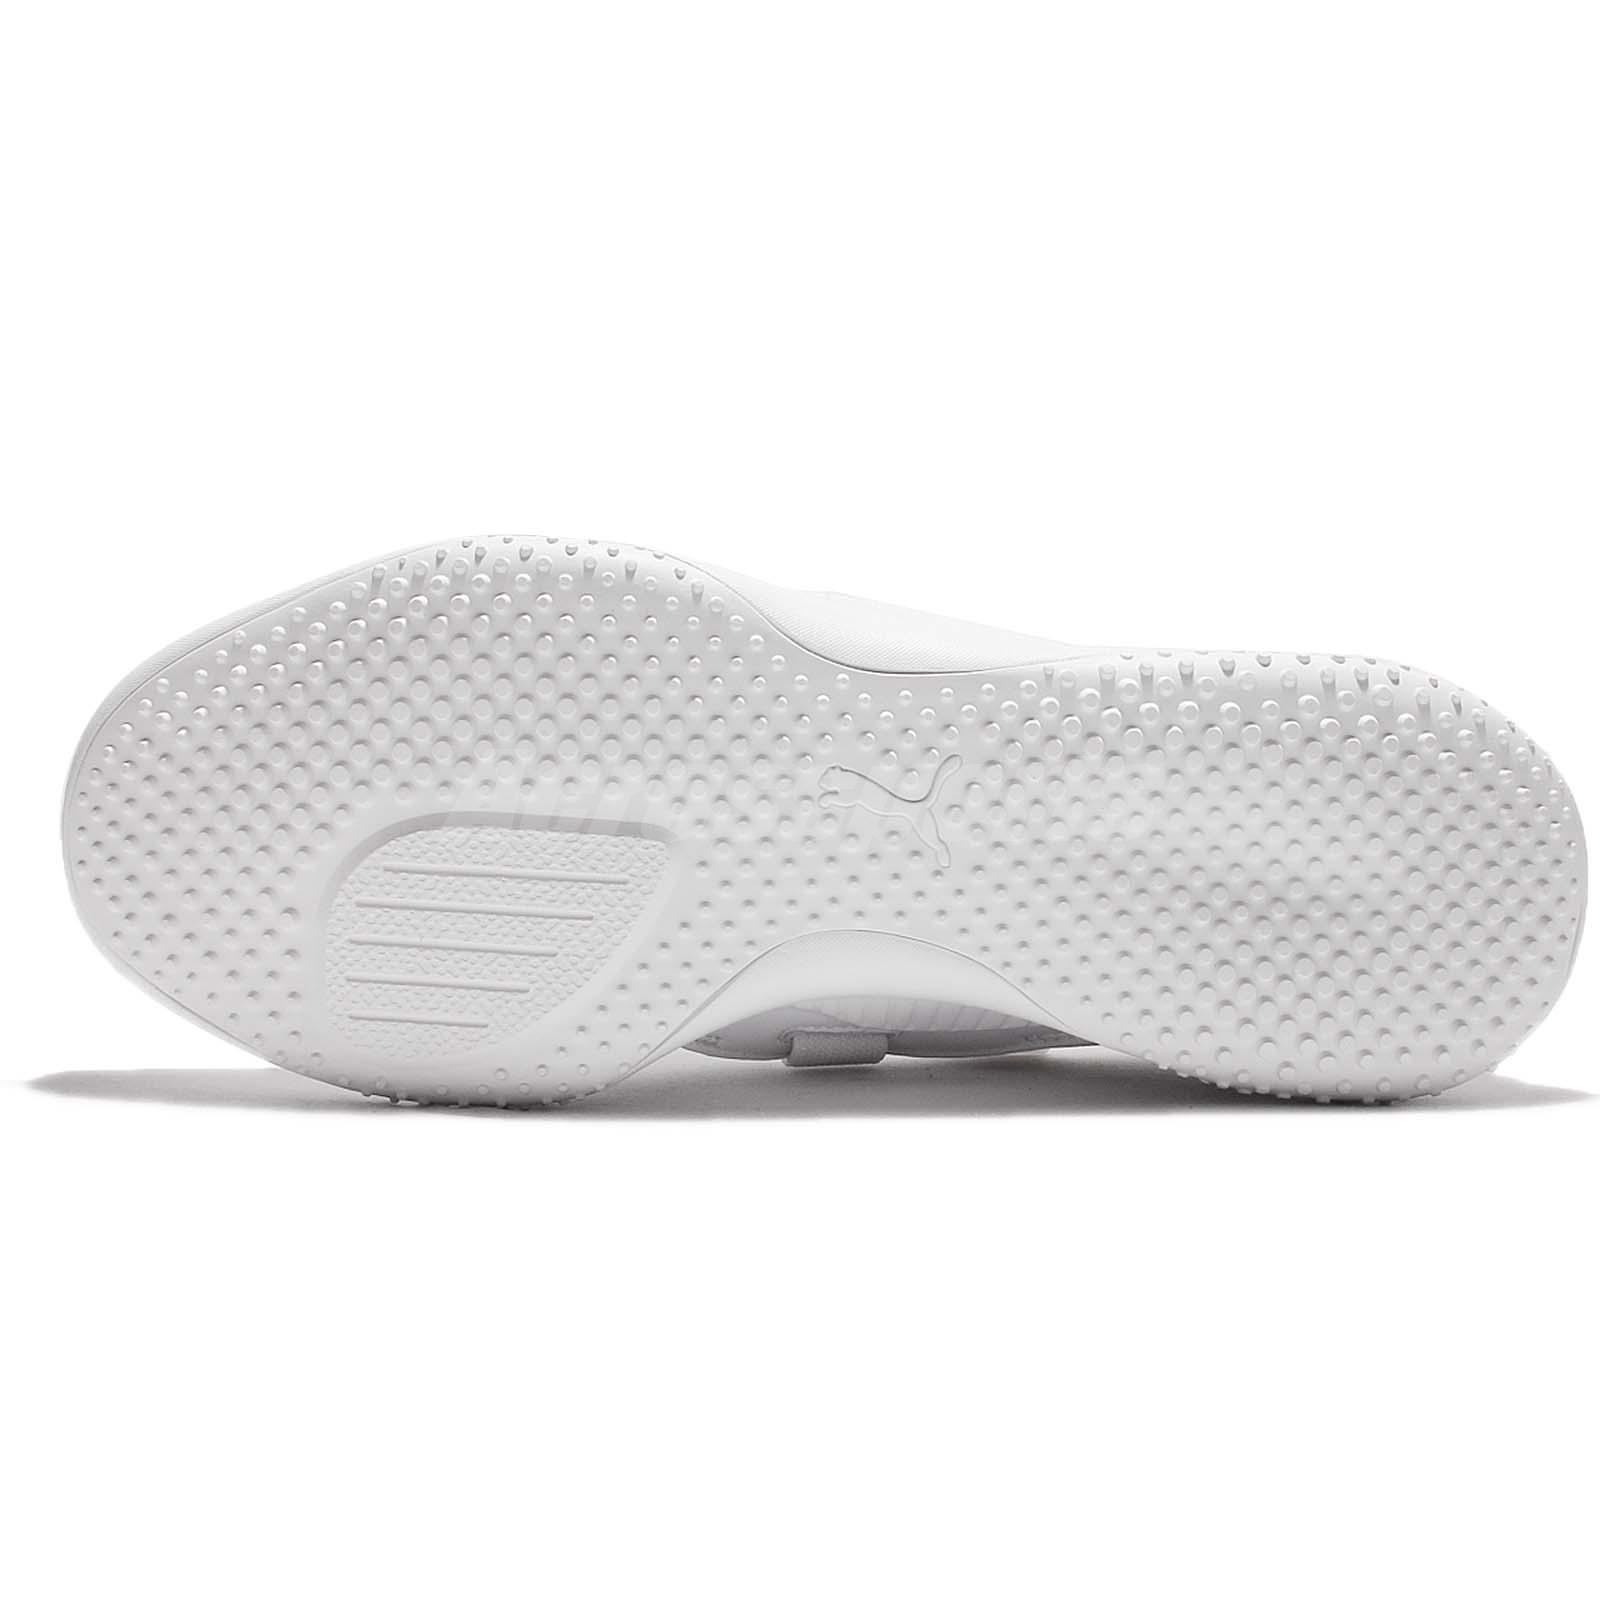 f5d7a3baaa74 Puma Evolution Mostro Triple White Men Casual Lightweight Sneakers ...